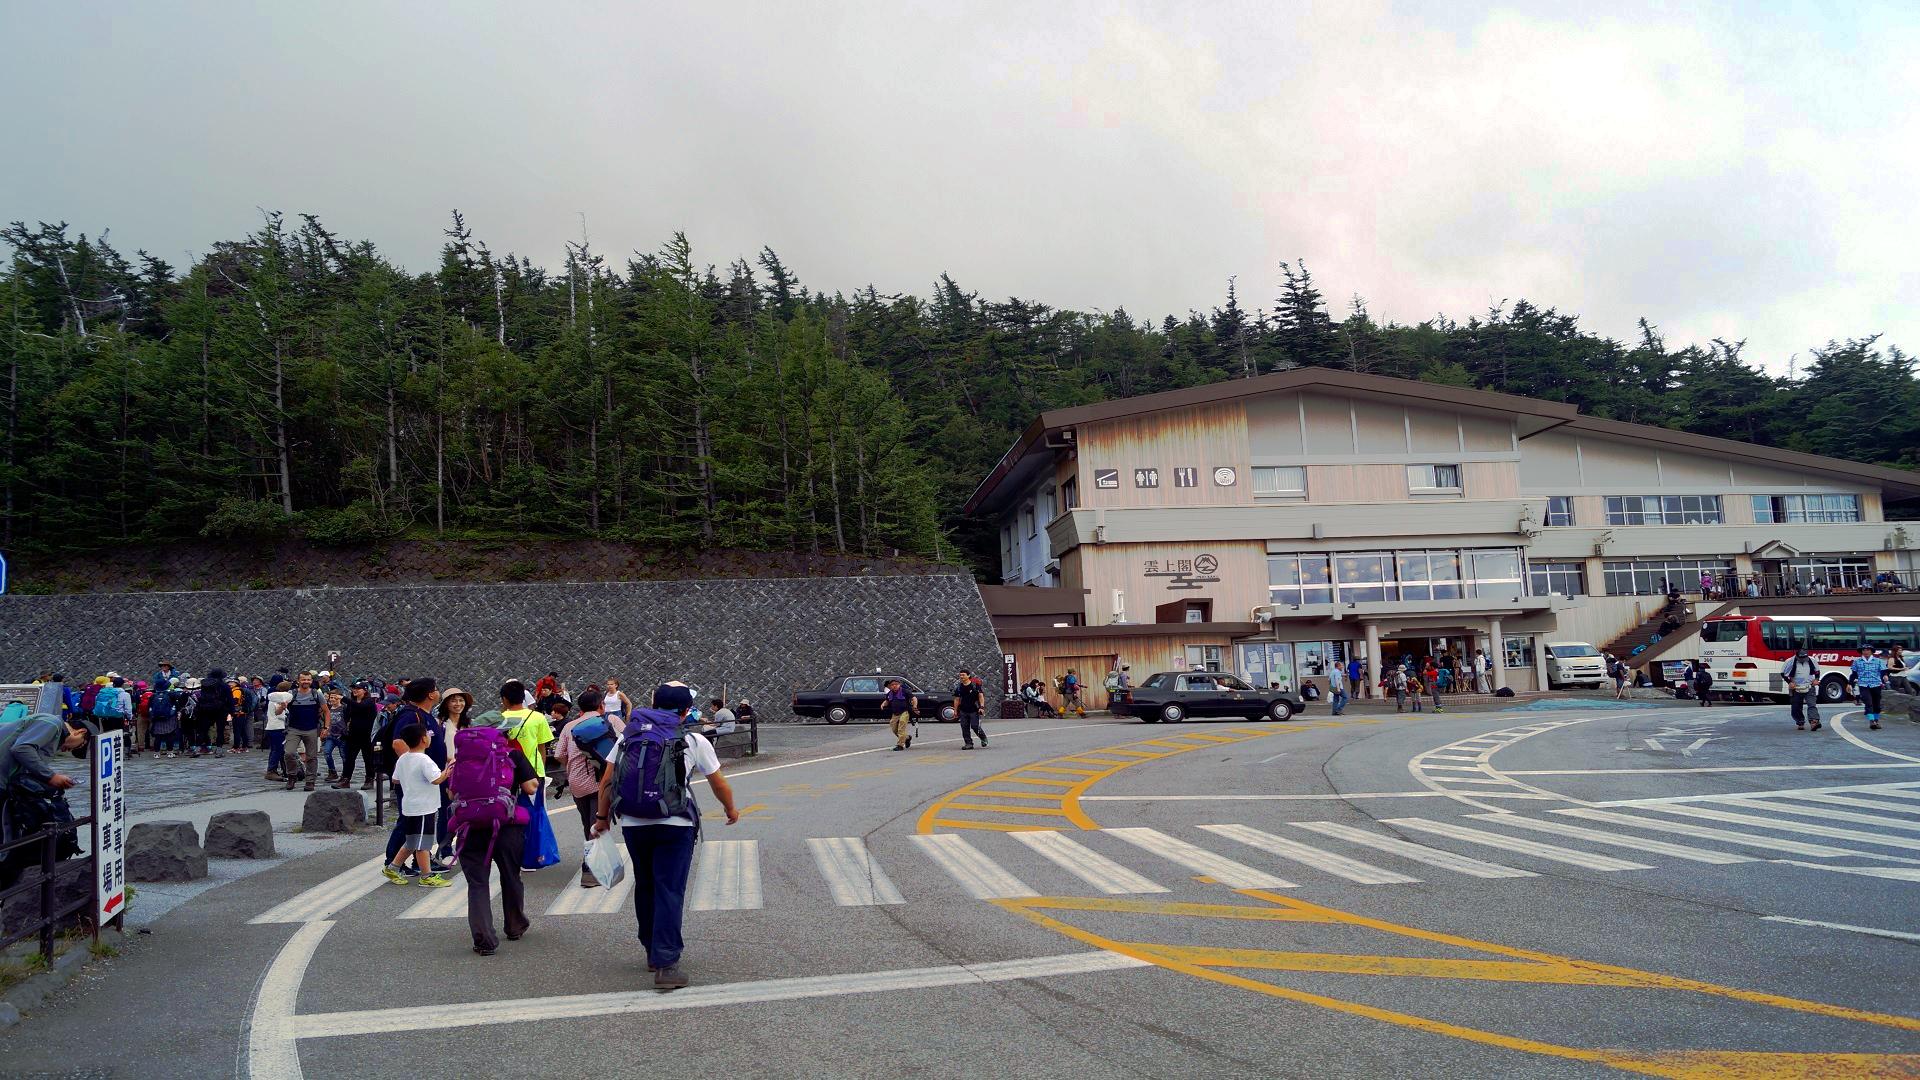 Fuji Busstation (Foto: Marina Hochholzner)